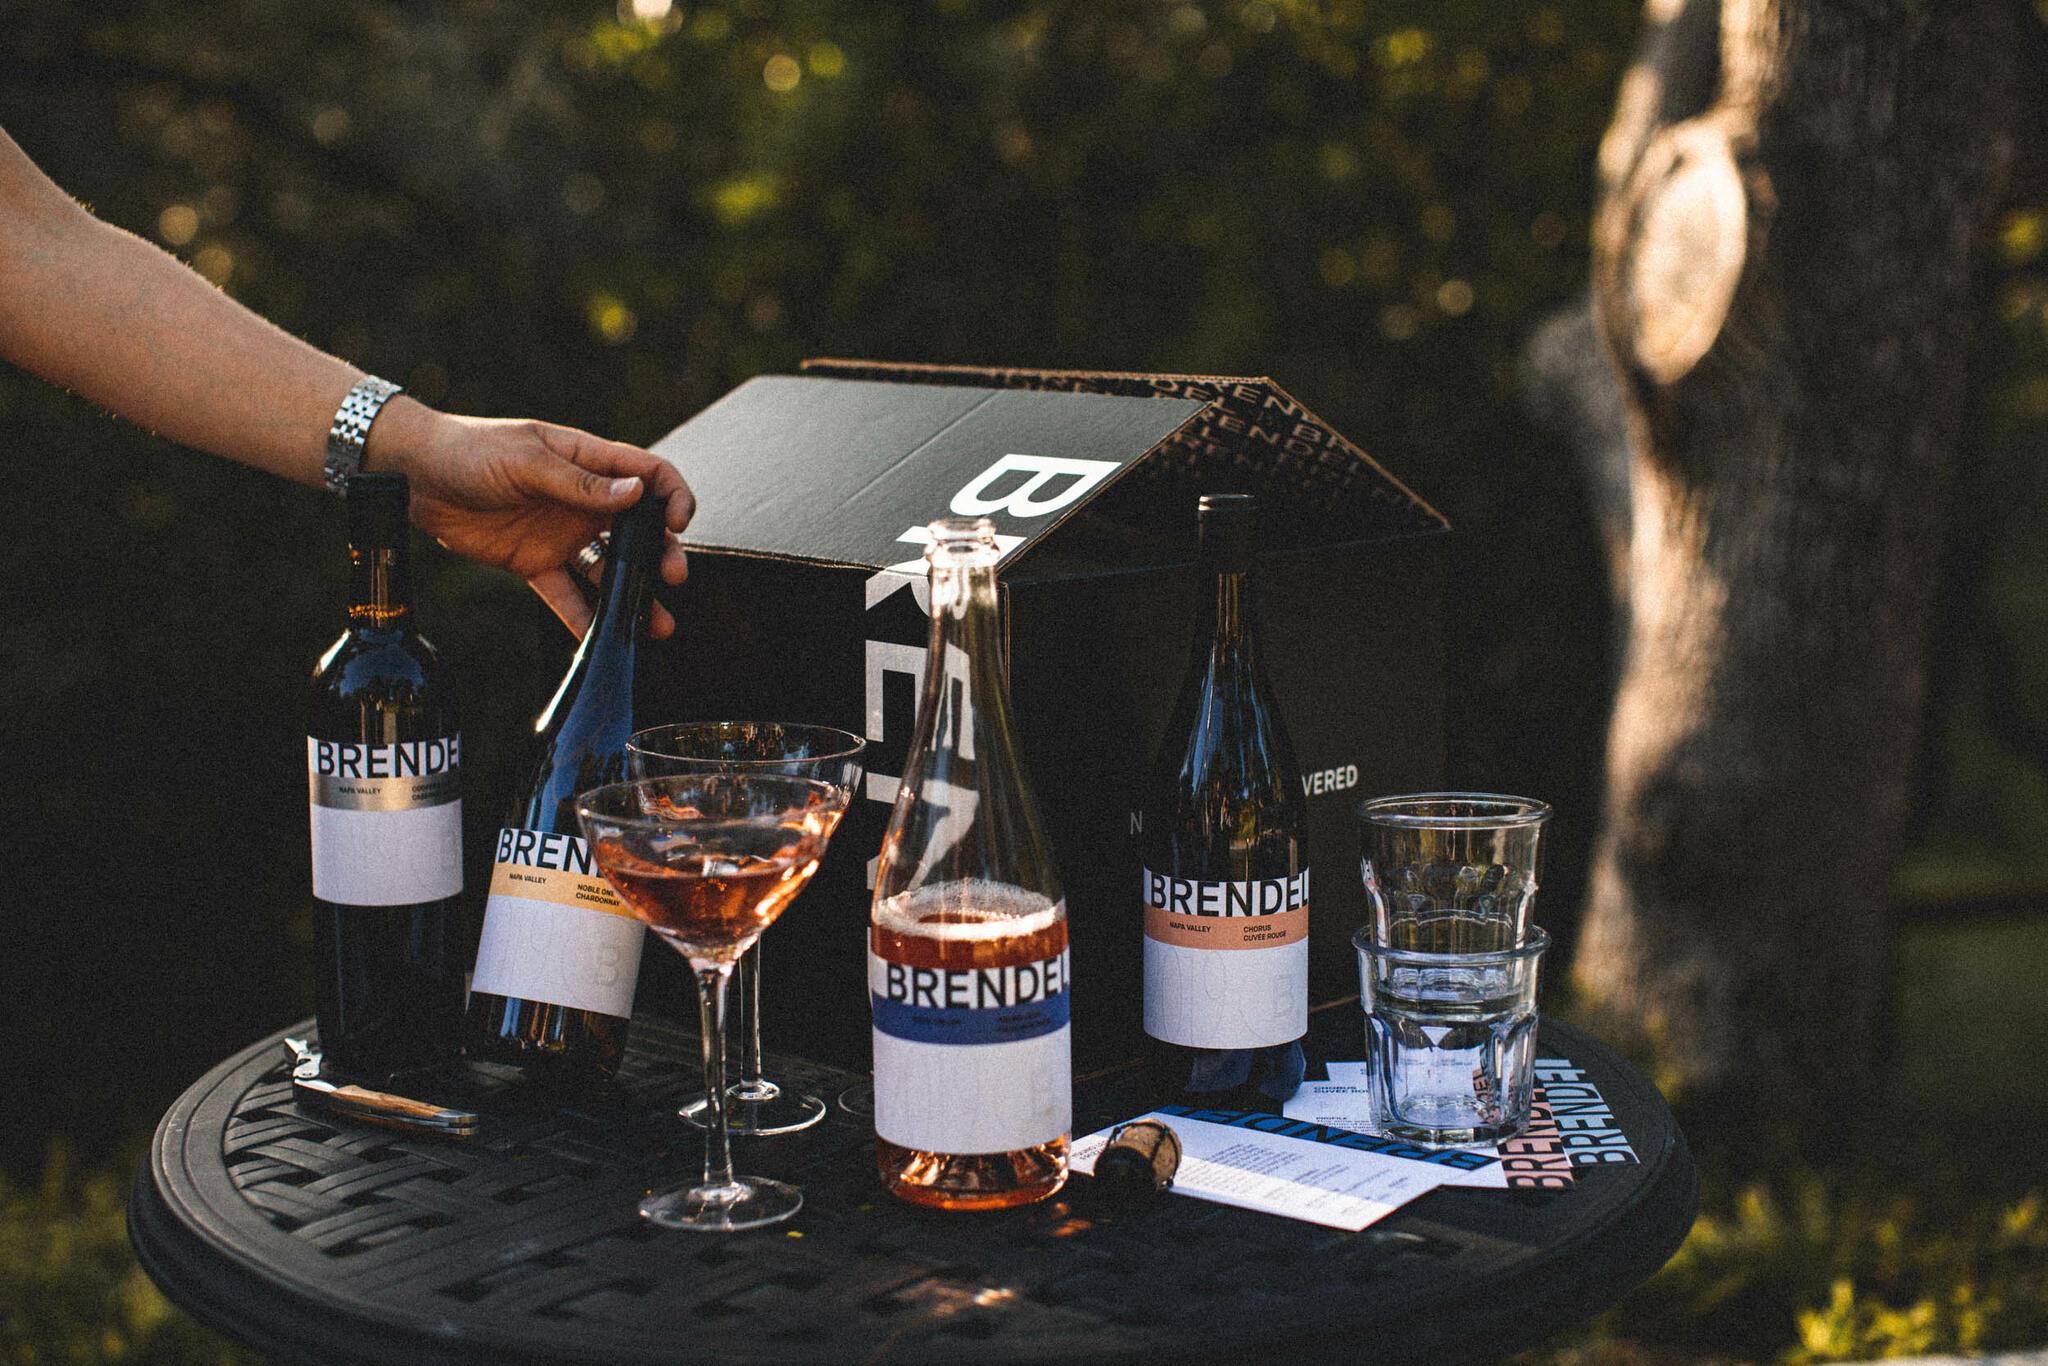 Brendel Wines Cover Image